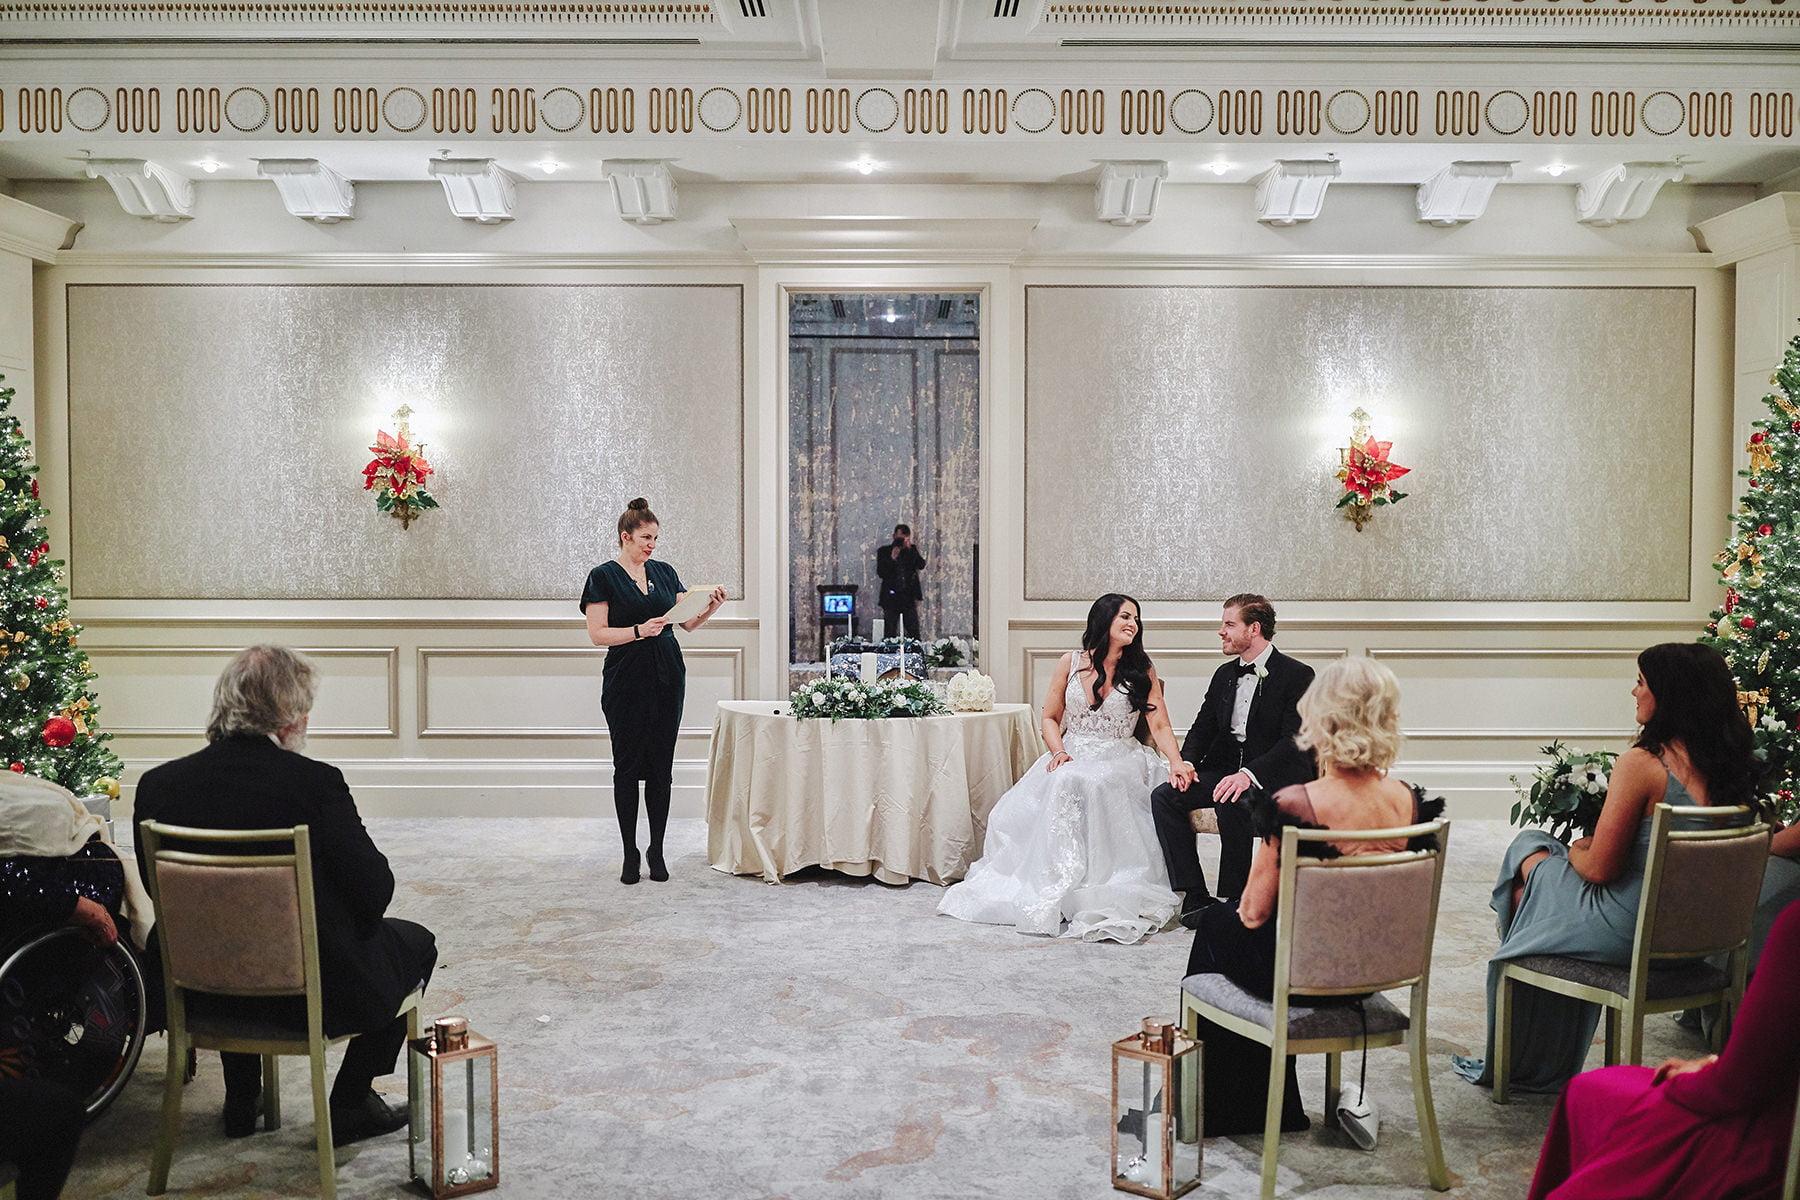 POWERSCOURT HOTEL RESORT INTIMATE WEDDING 43